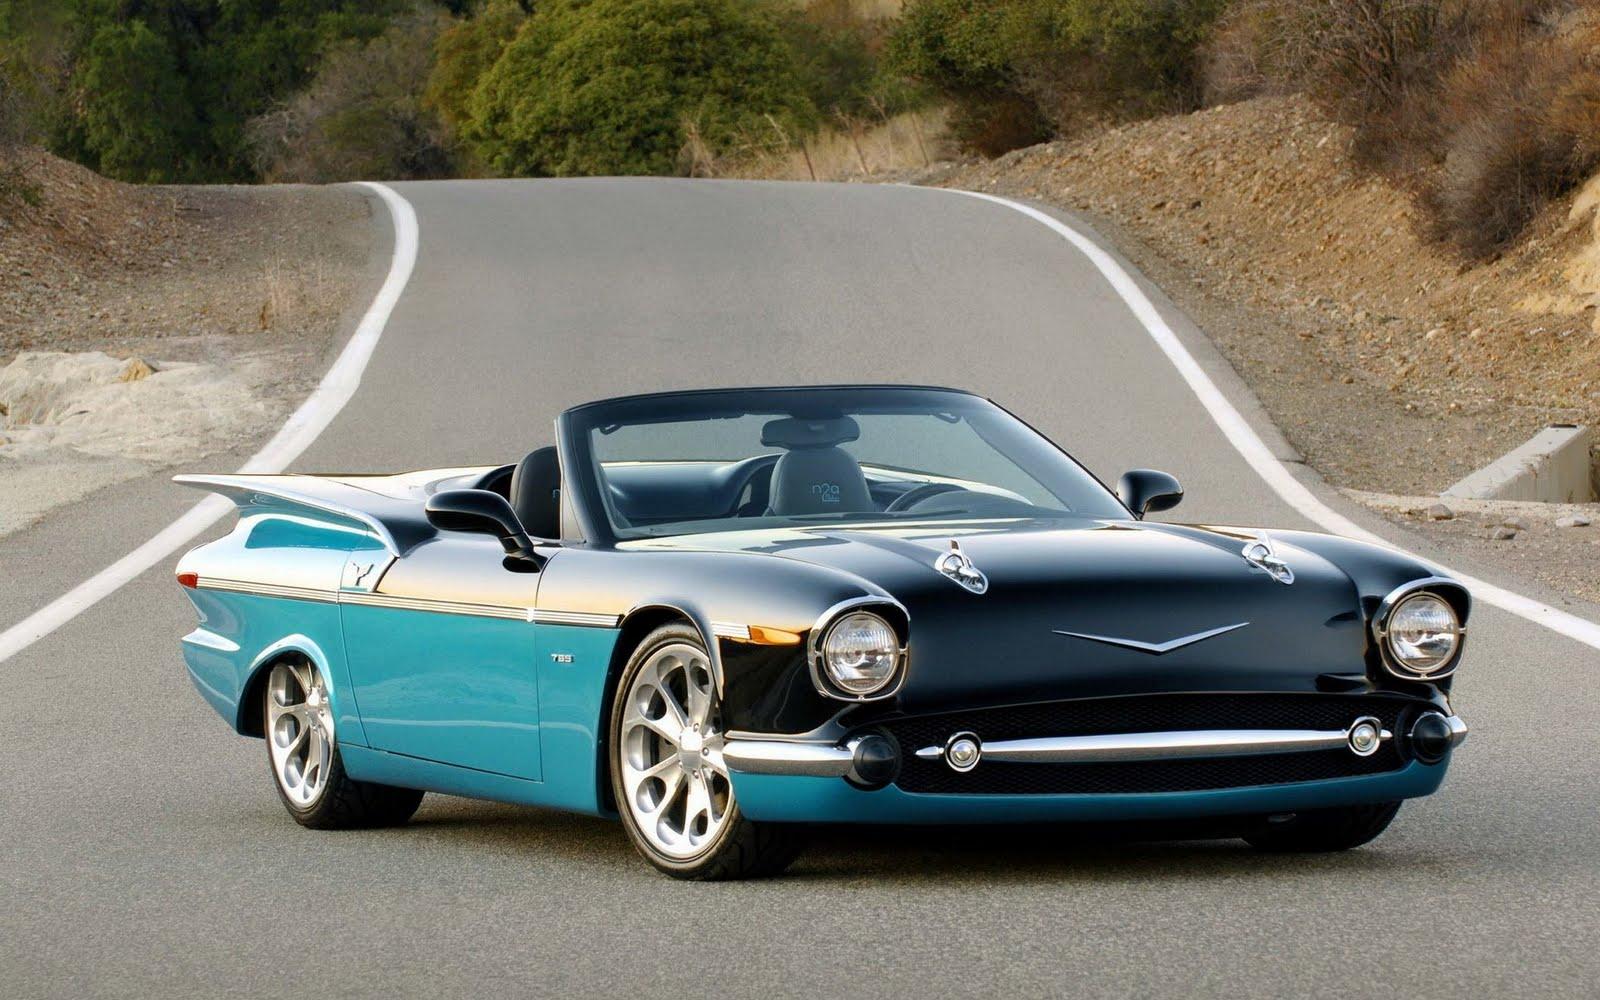 Banco De Im 193 Genes Chevrolet Corvette C6 Autos Cl 225 Sicos